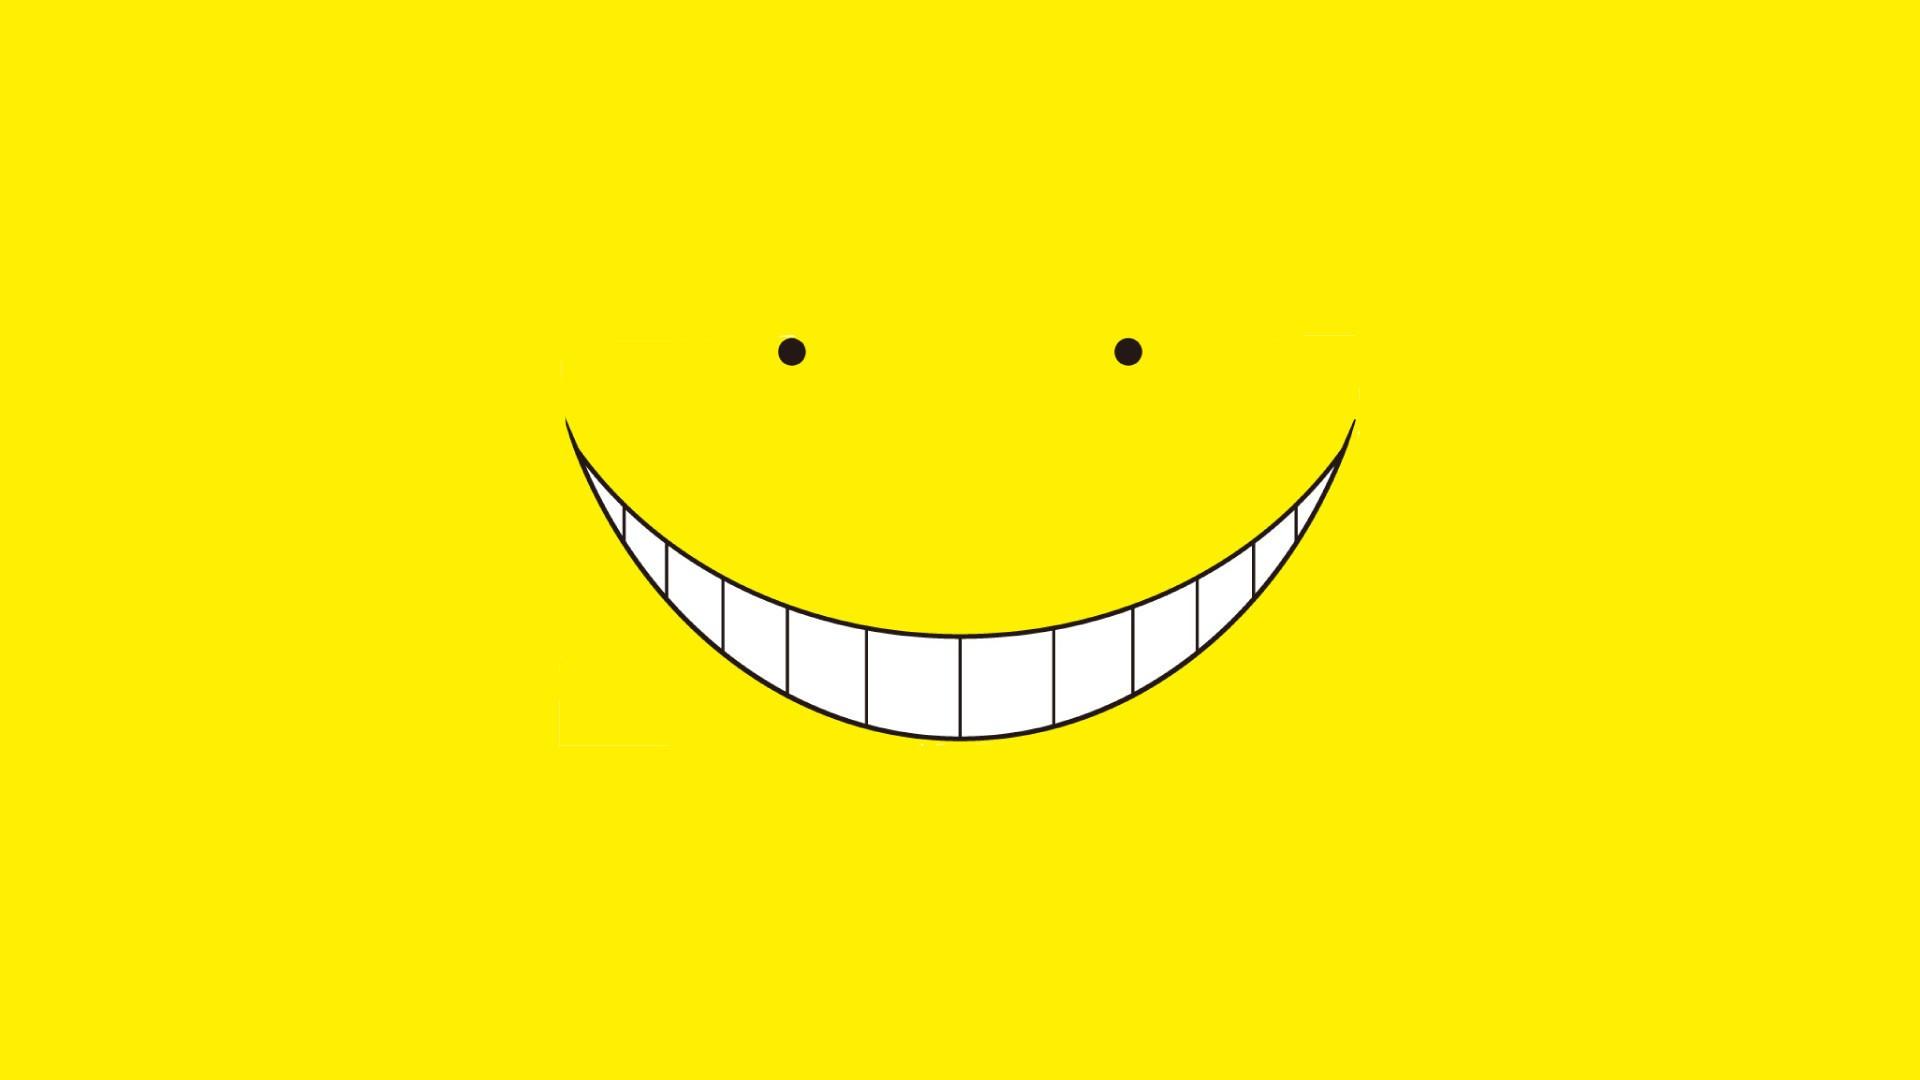 Wallpaper : anime, text, yellow, circle ...